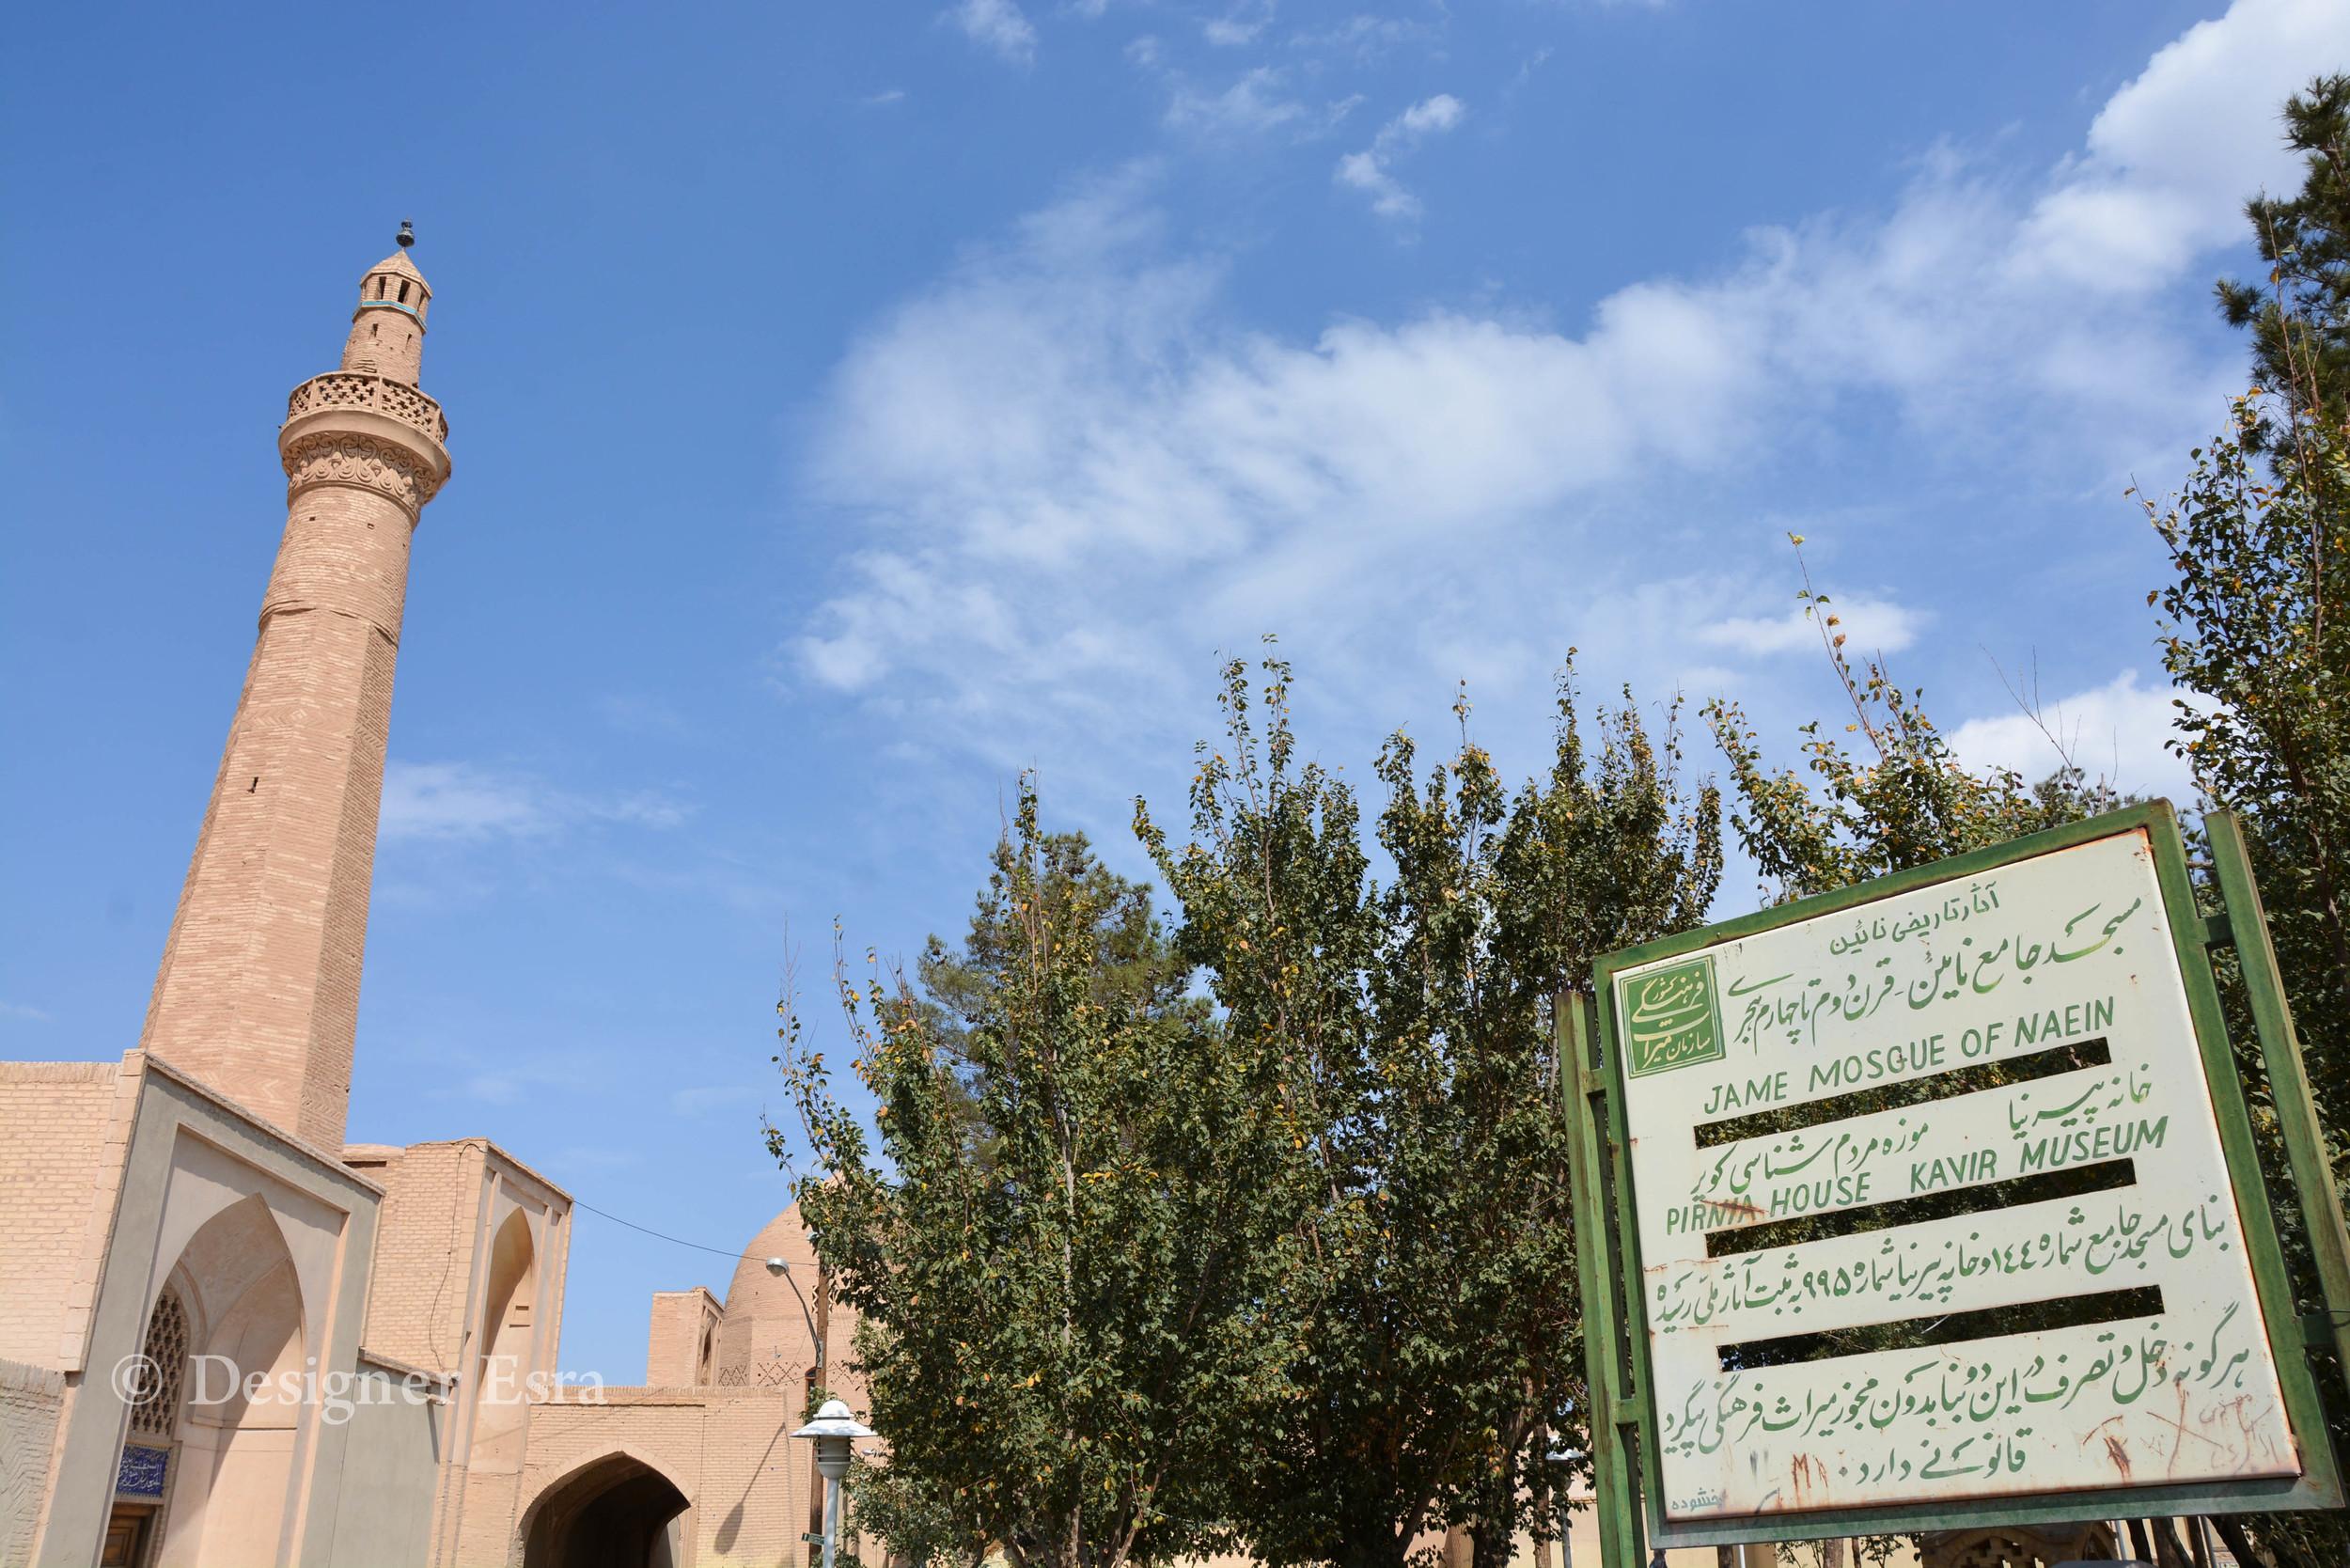 Jamea Mosque of Naein